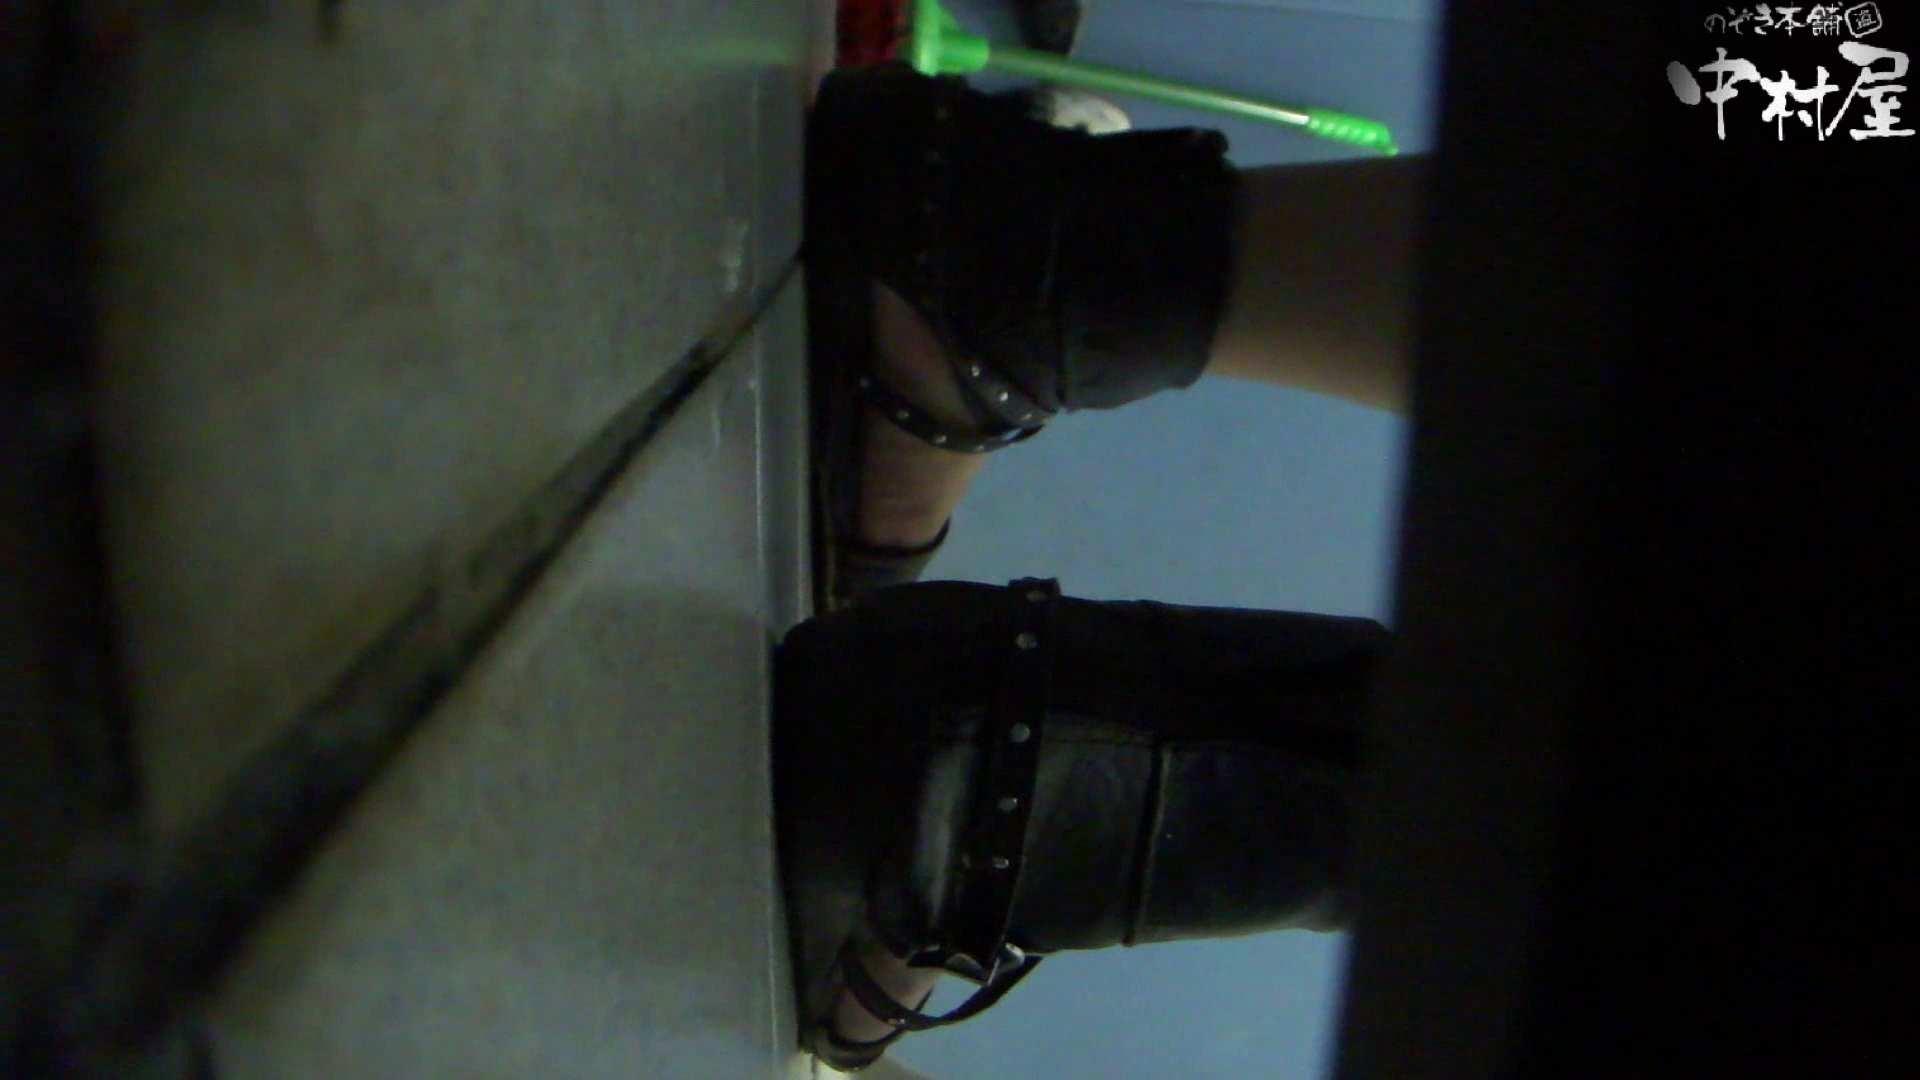 GOD HAND ファッションショッピングセンター盗撮vol.07 OLのエロ生活 AV無料動画キャプチャ 25連発 11